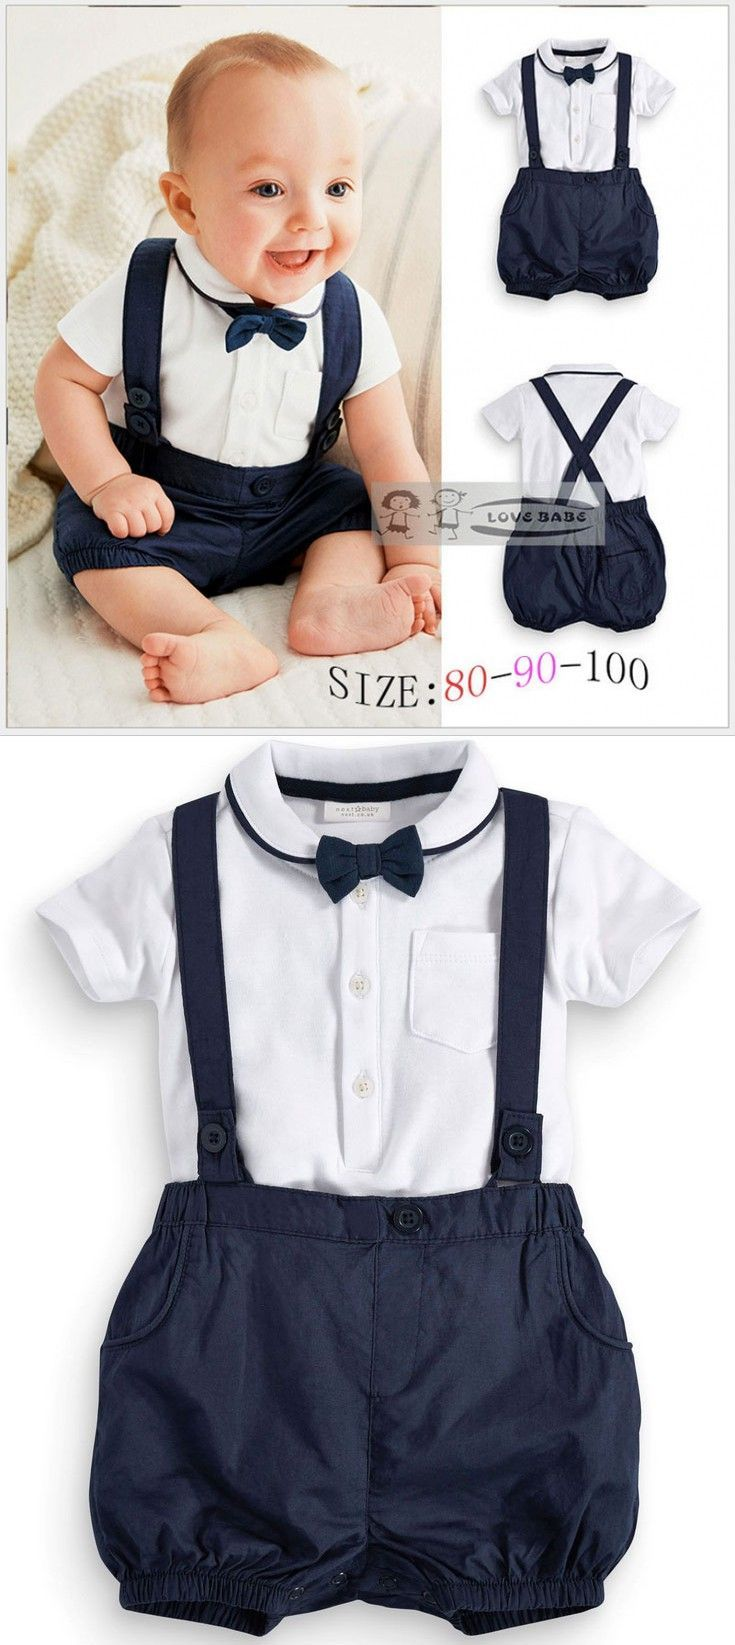 wedding dress for boys baby wedding dresses Summer Baby Clothing Cotton 2pcs Suit Short Infant Boy Gentleman Suspender Gift Sets For Newborns Christening